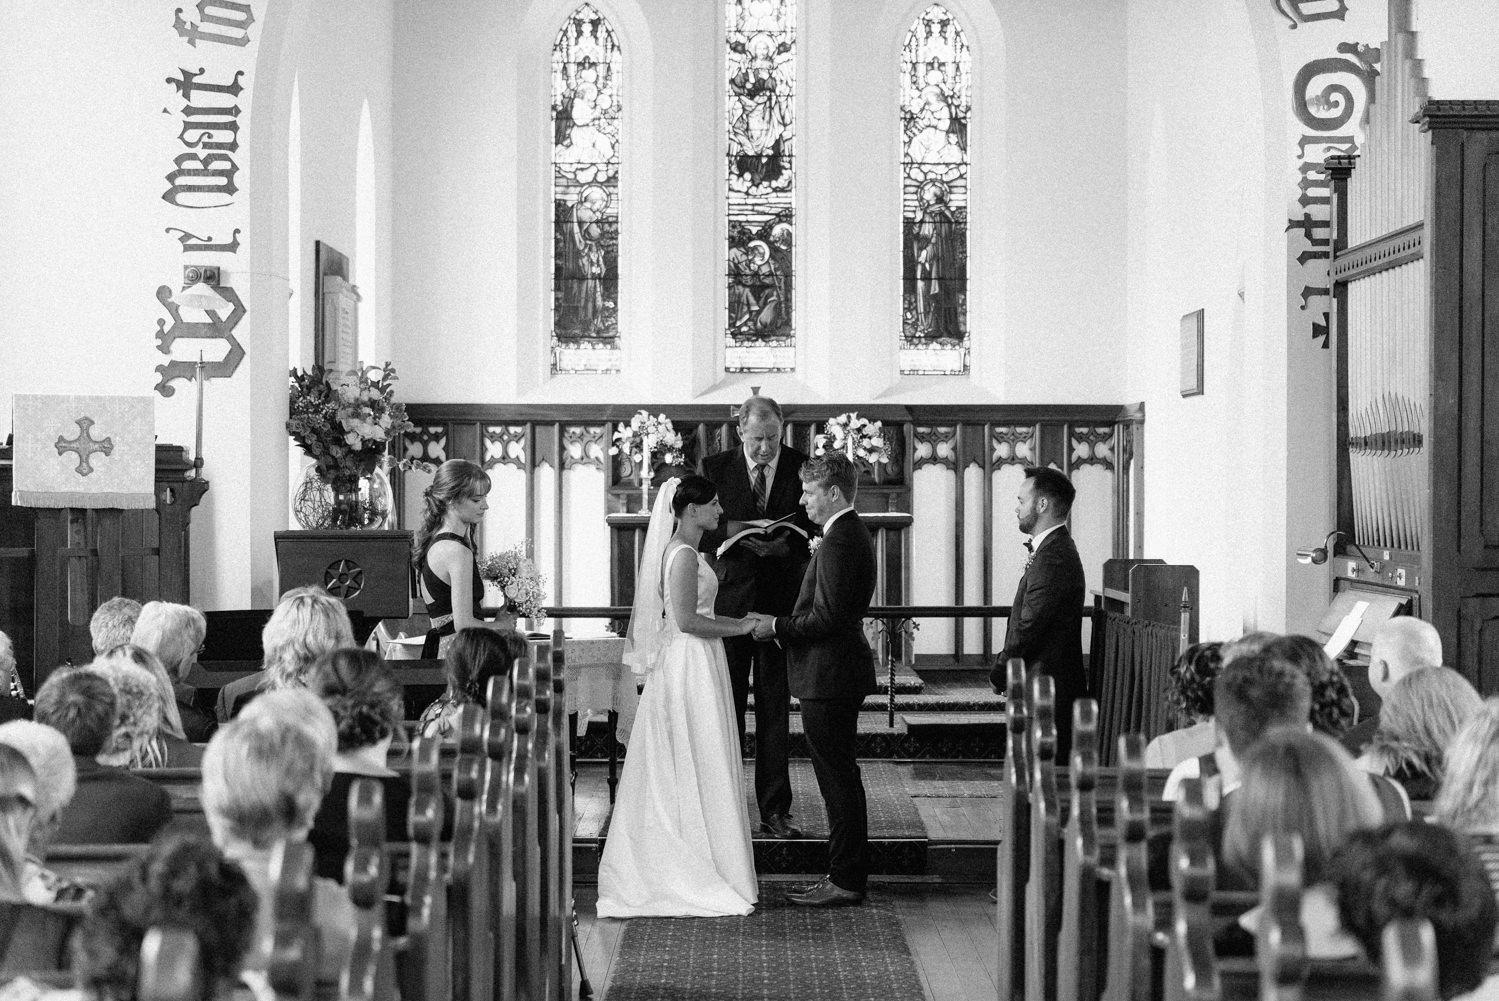 Josef-Chromy-Wedding-Photographer-29.jpg